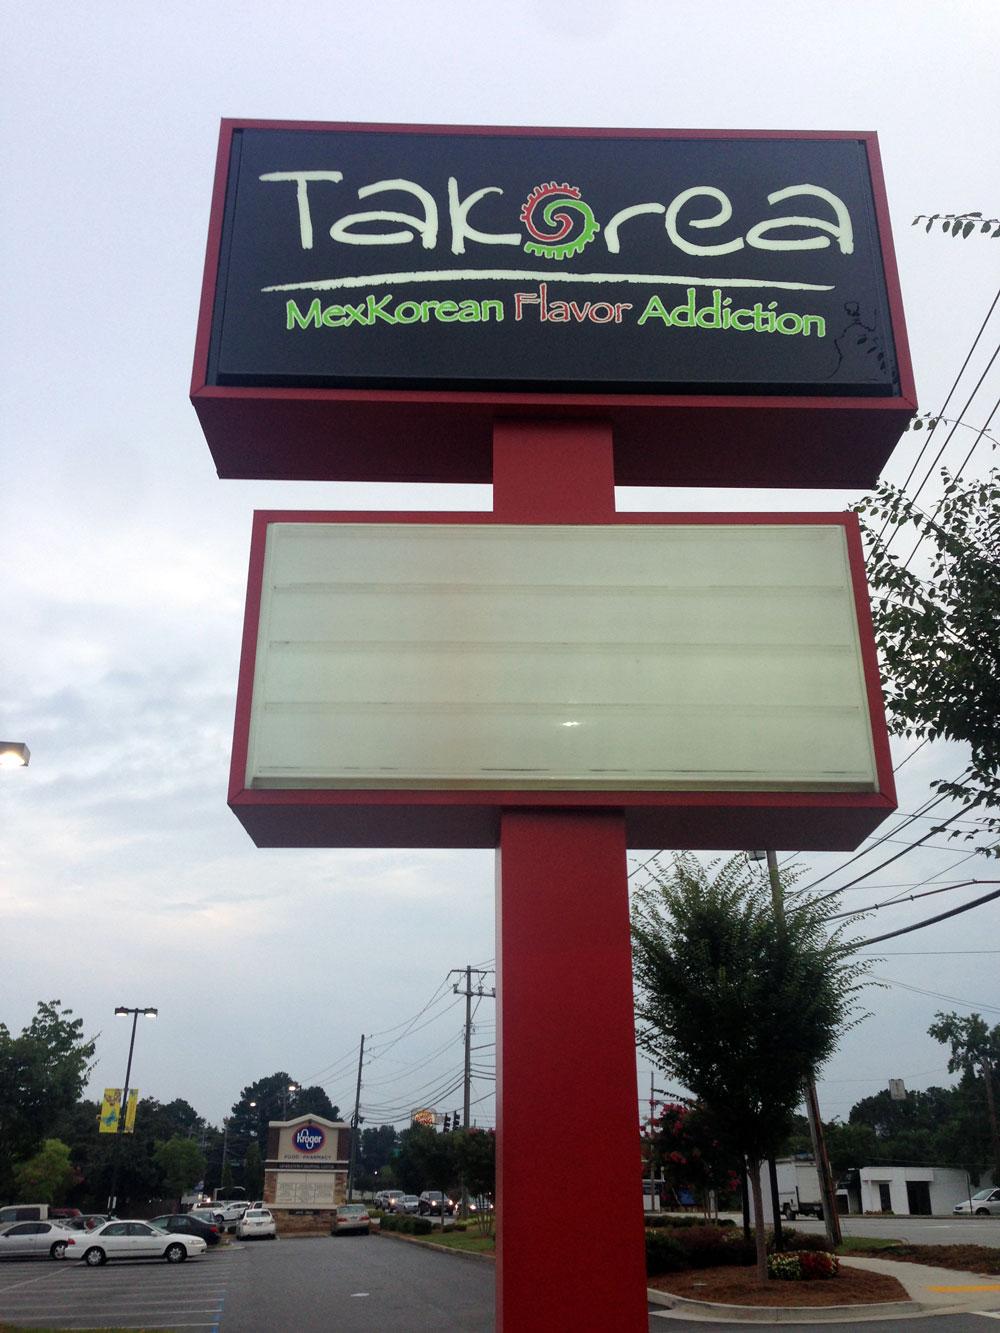 Closest Fast Food Restaurant